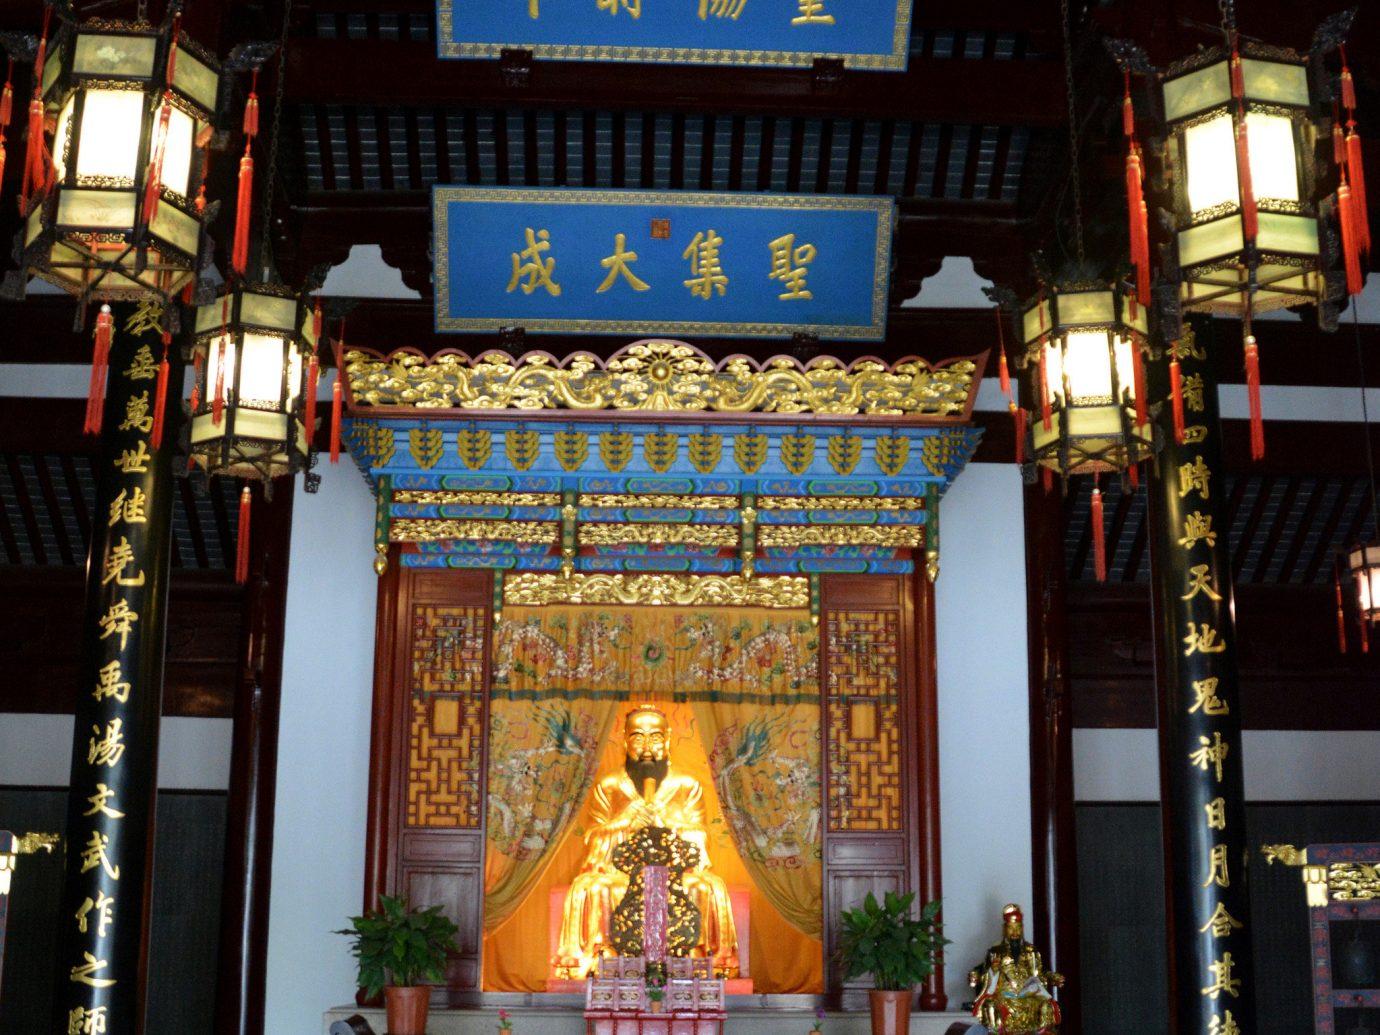 China china rose Shanghai Travel Tips Trip Ideas landmark shrine temple tourist attraction night place of worship building